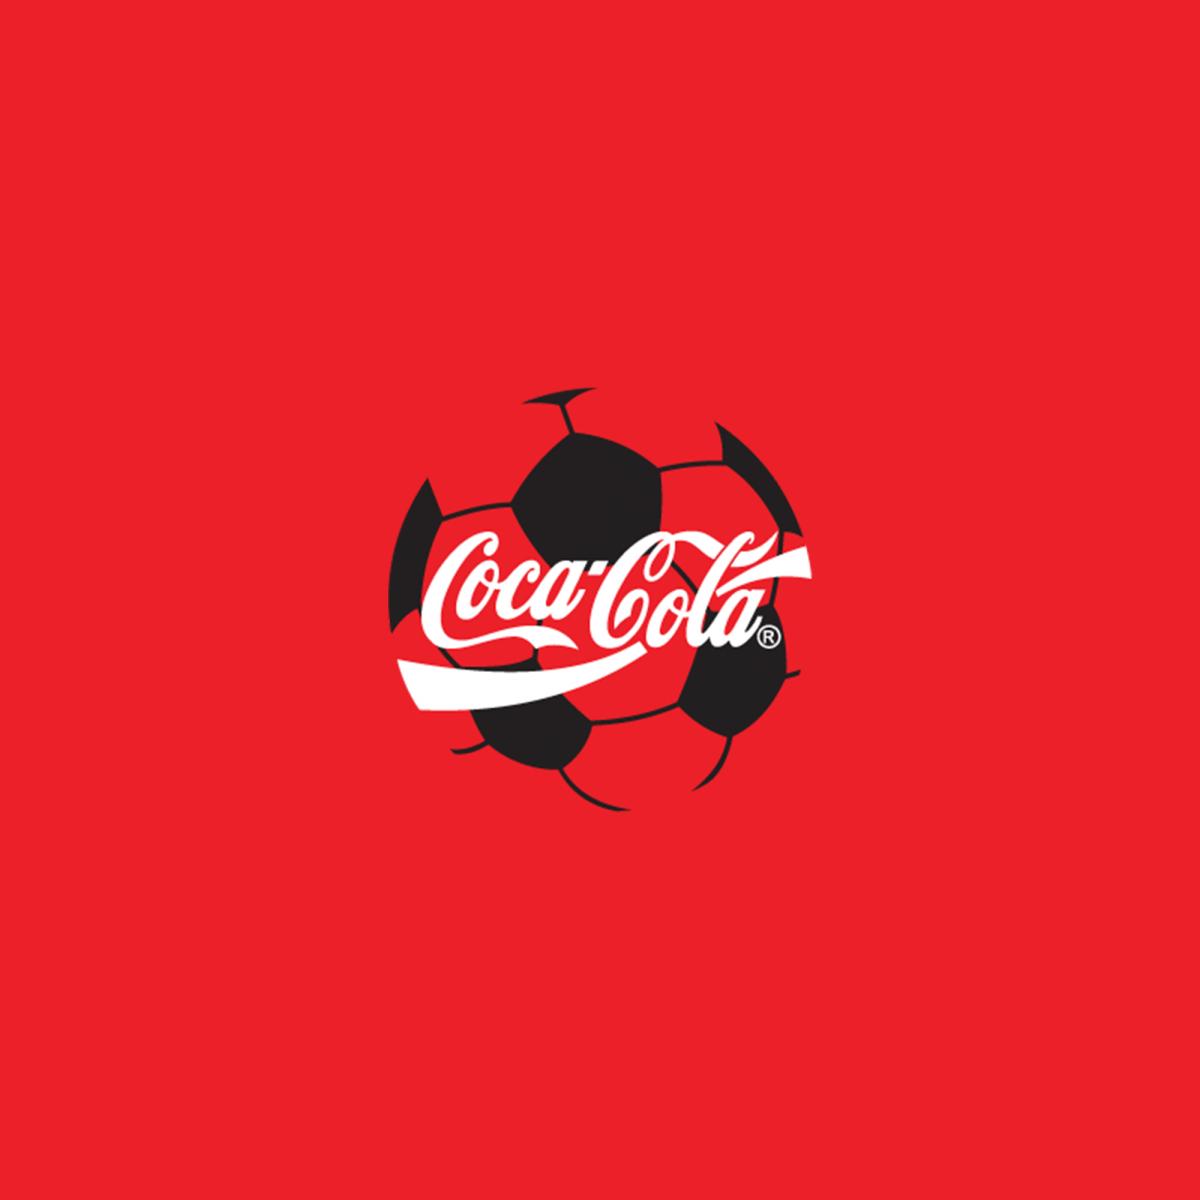 Coca Cola Mundial Brasil 2014